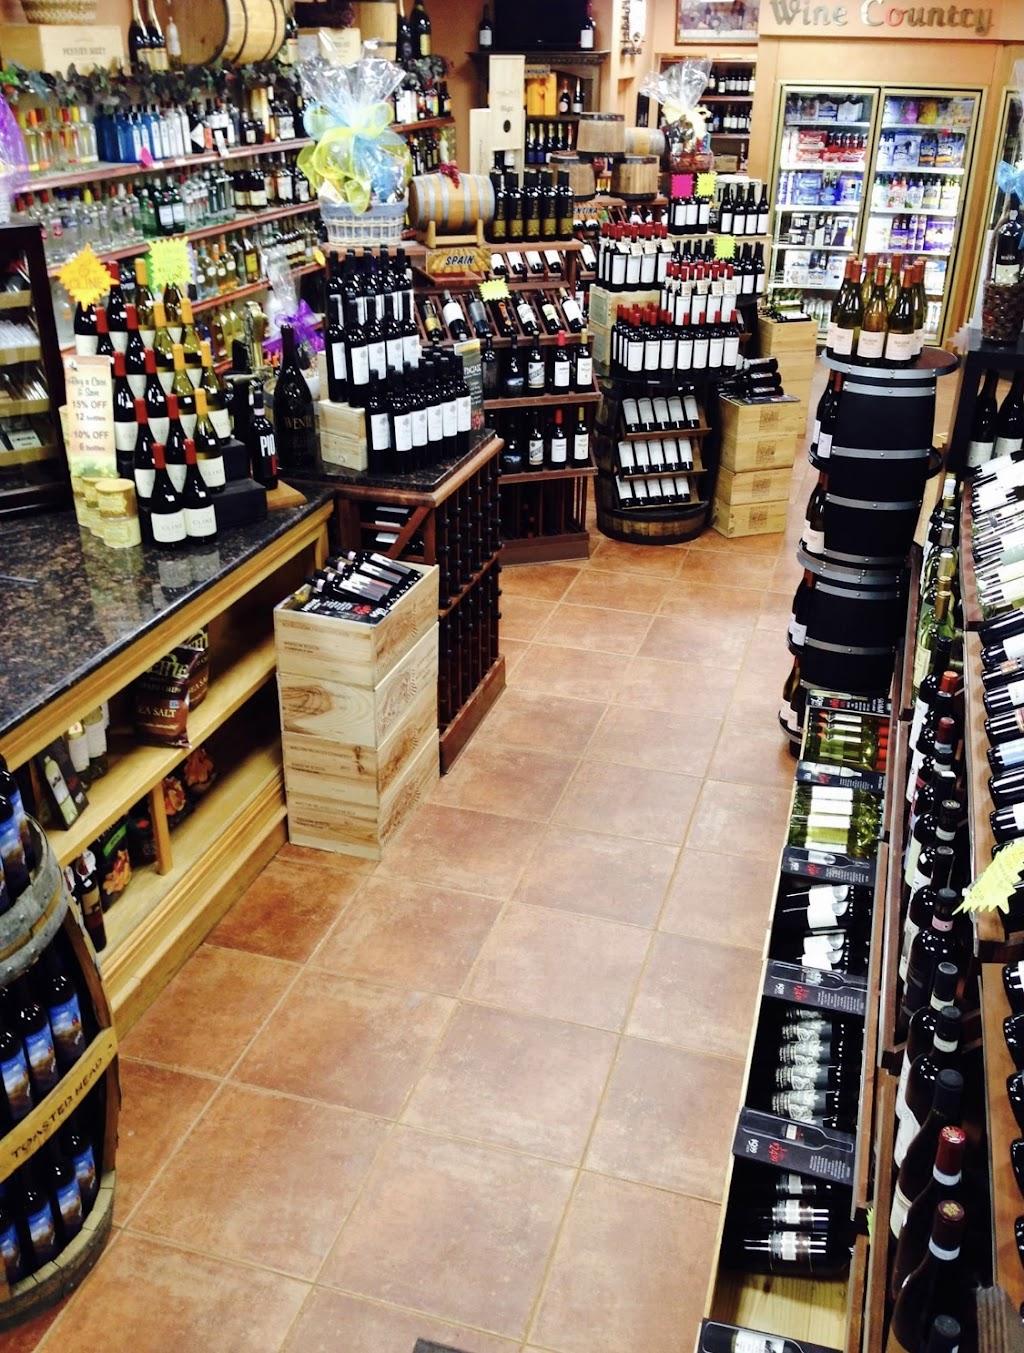 Wine Country Inc - store  | Photo 3 of 9 | Address: 741 Main St, Winchester, MA 01890, USA | Phone: (781) 721-1045